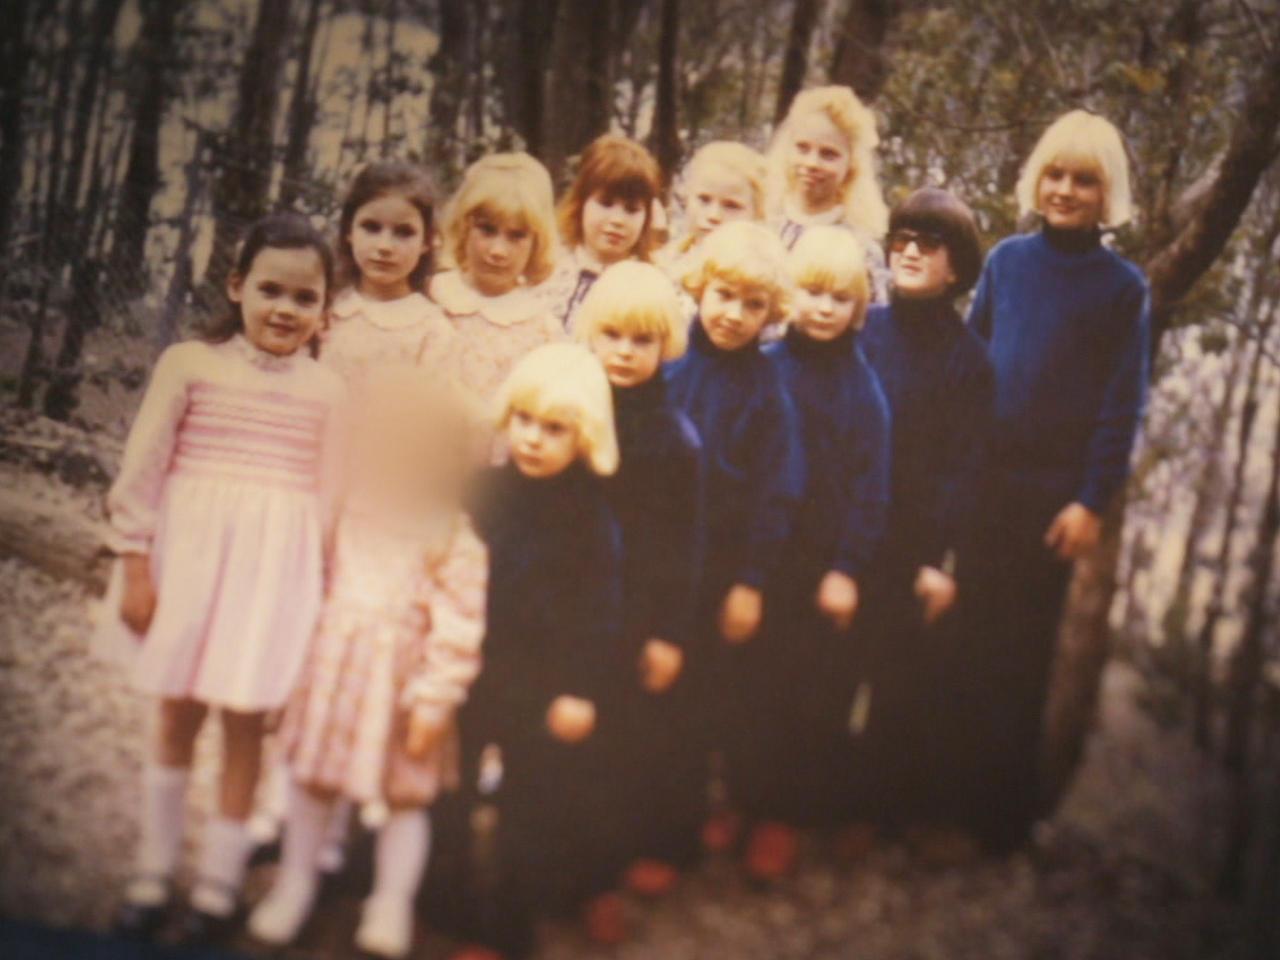 Adult children of dating widows in Australia